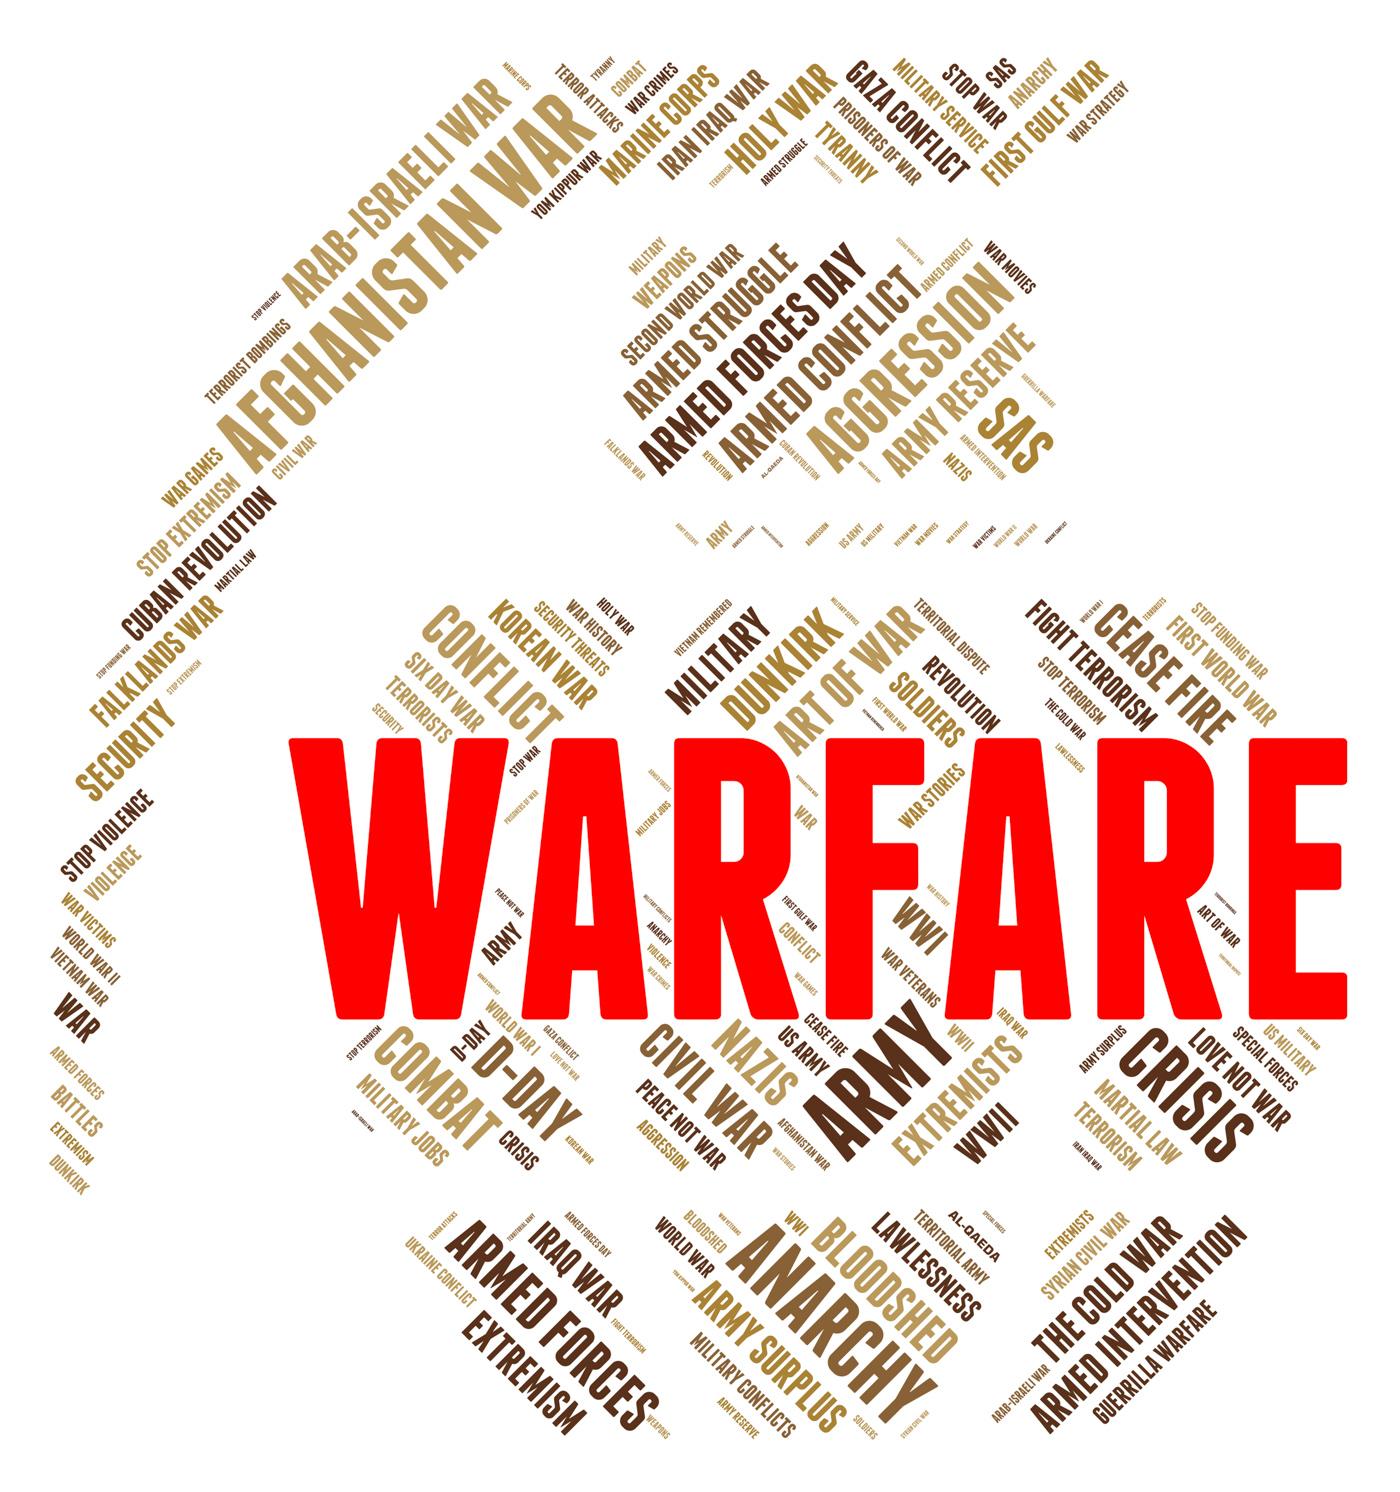 Warfare word shows fighting battle and skirmish photo